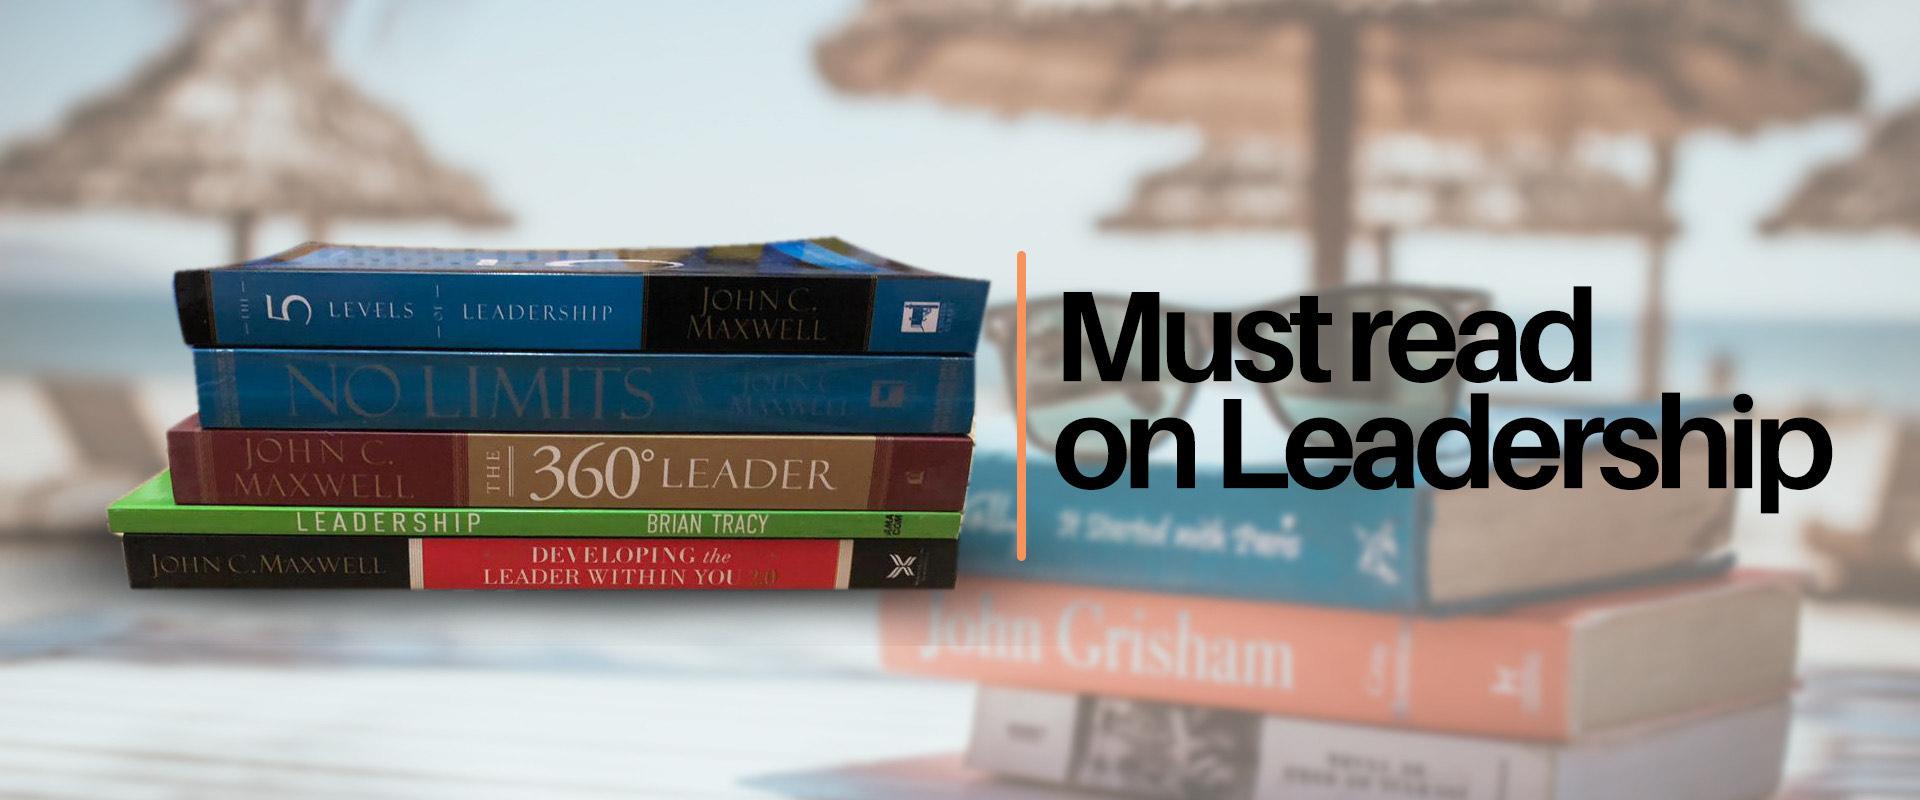 Leadershp banner